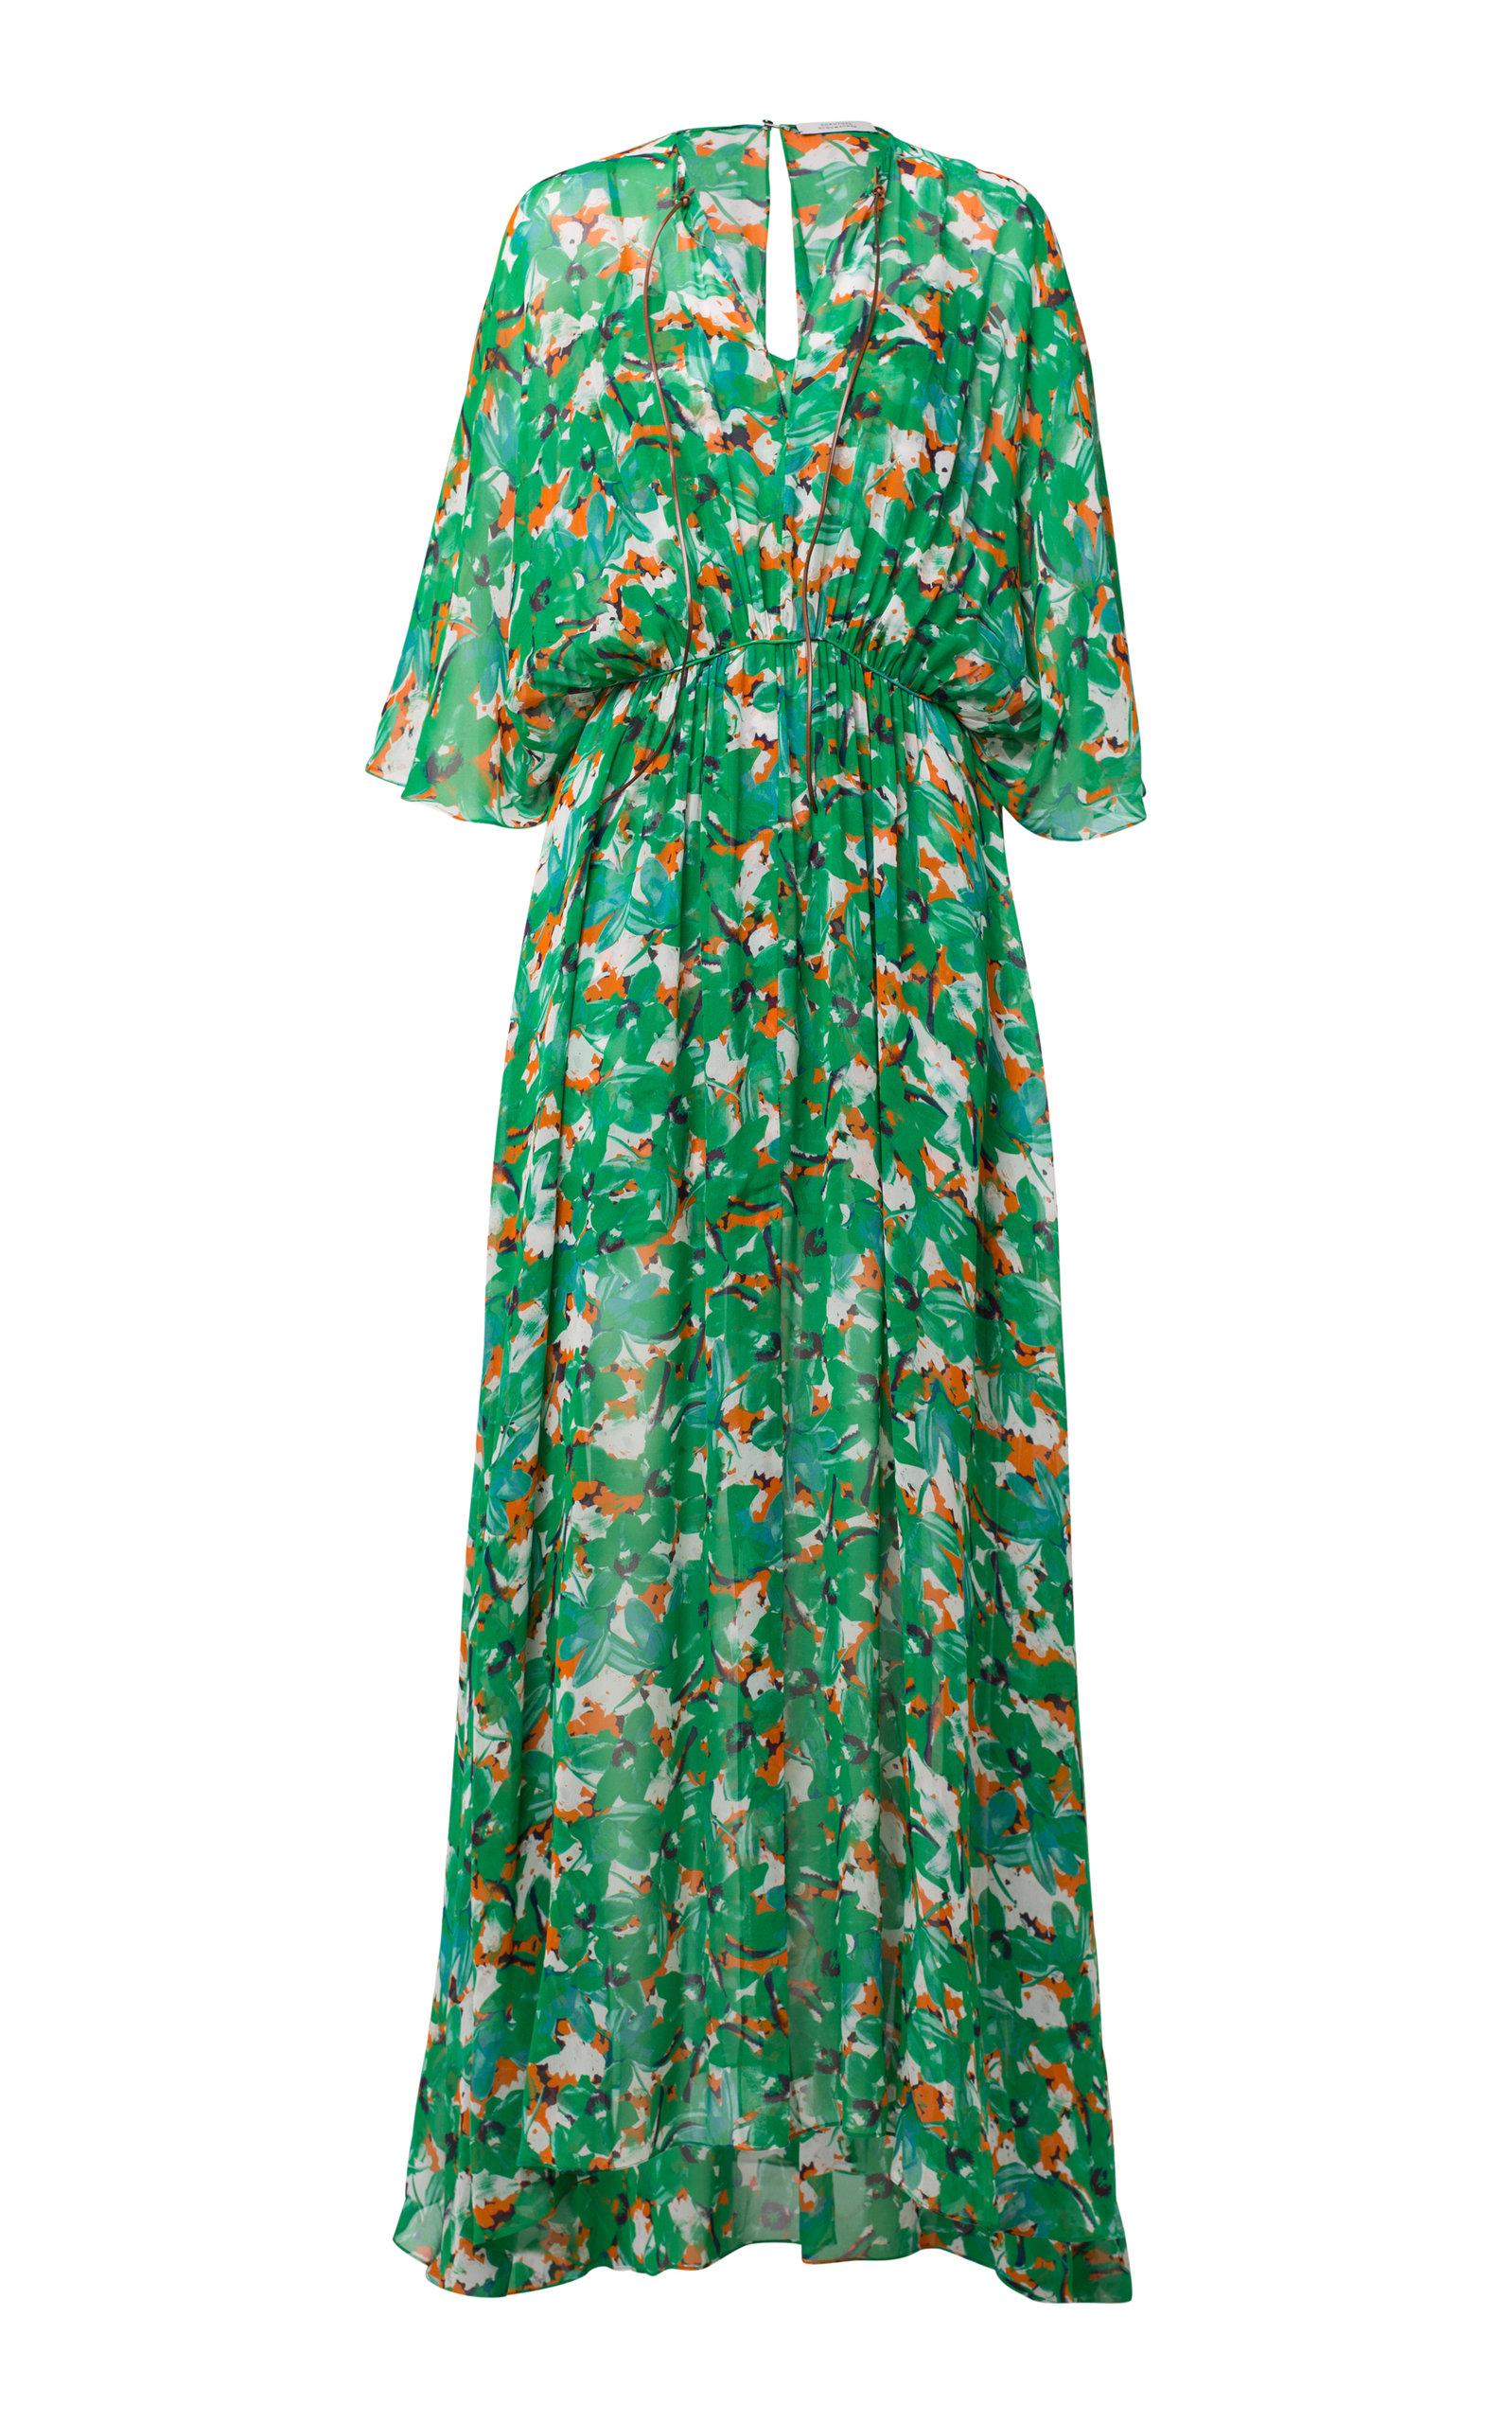 CARIBBEAN GARDENS GEORGETTE DRESS